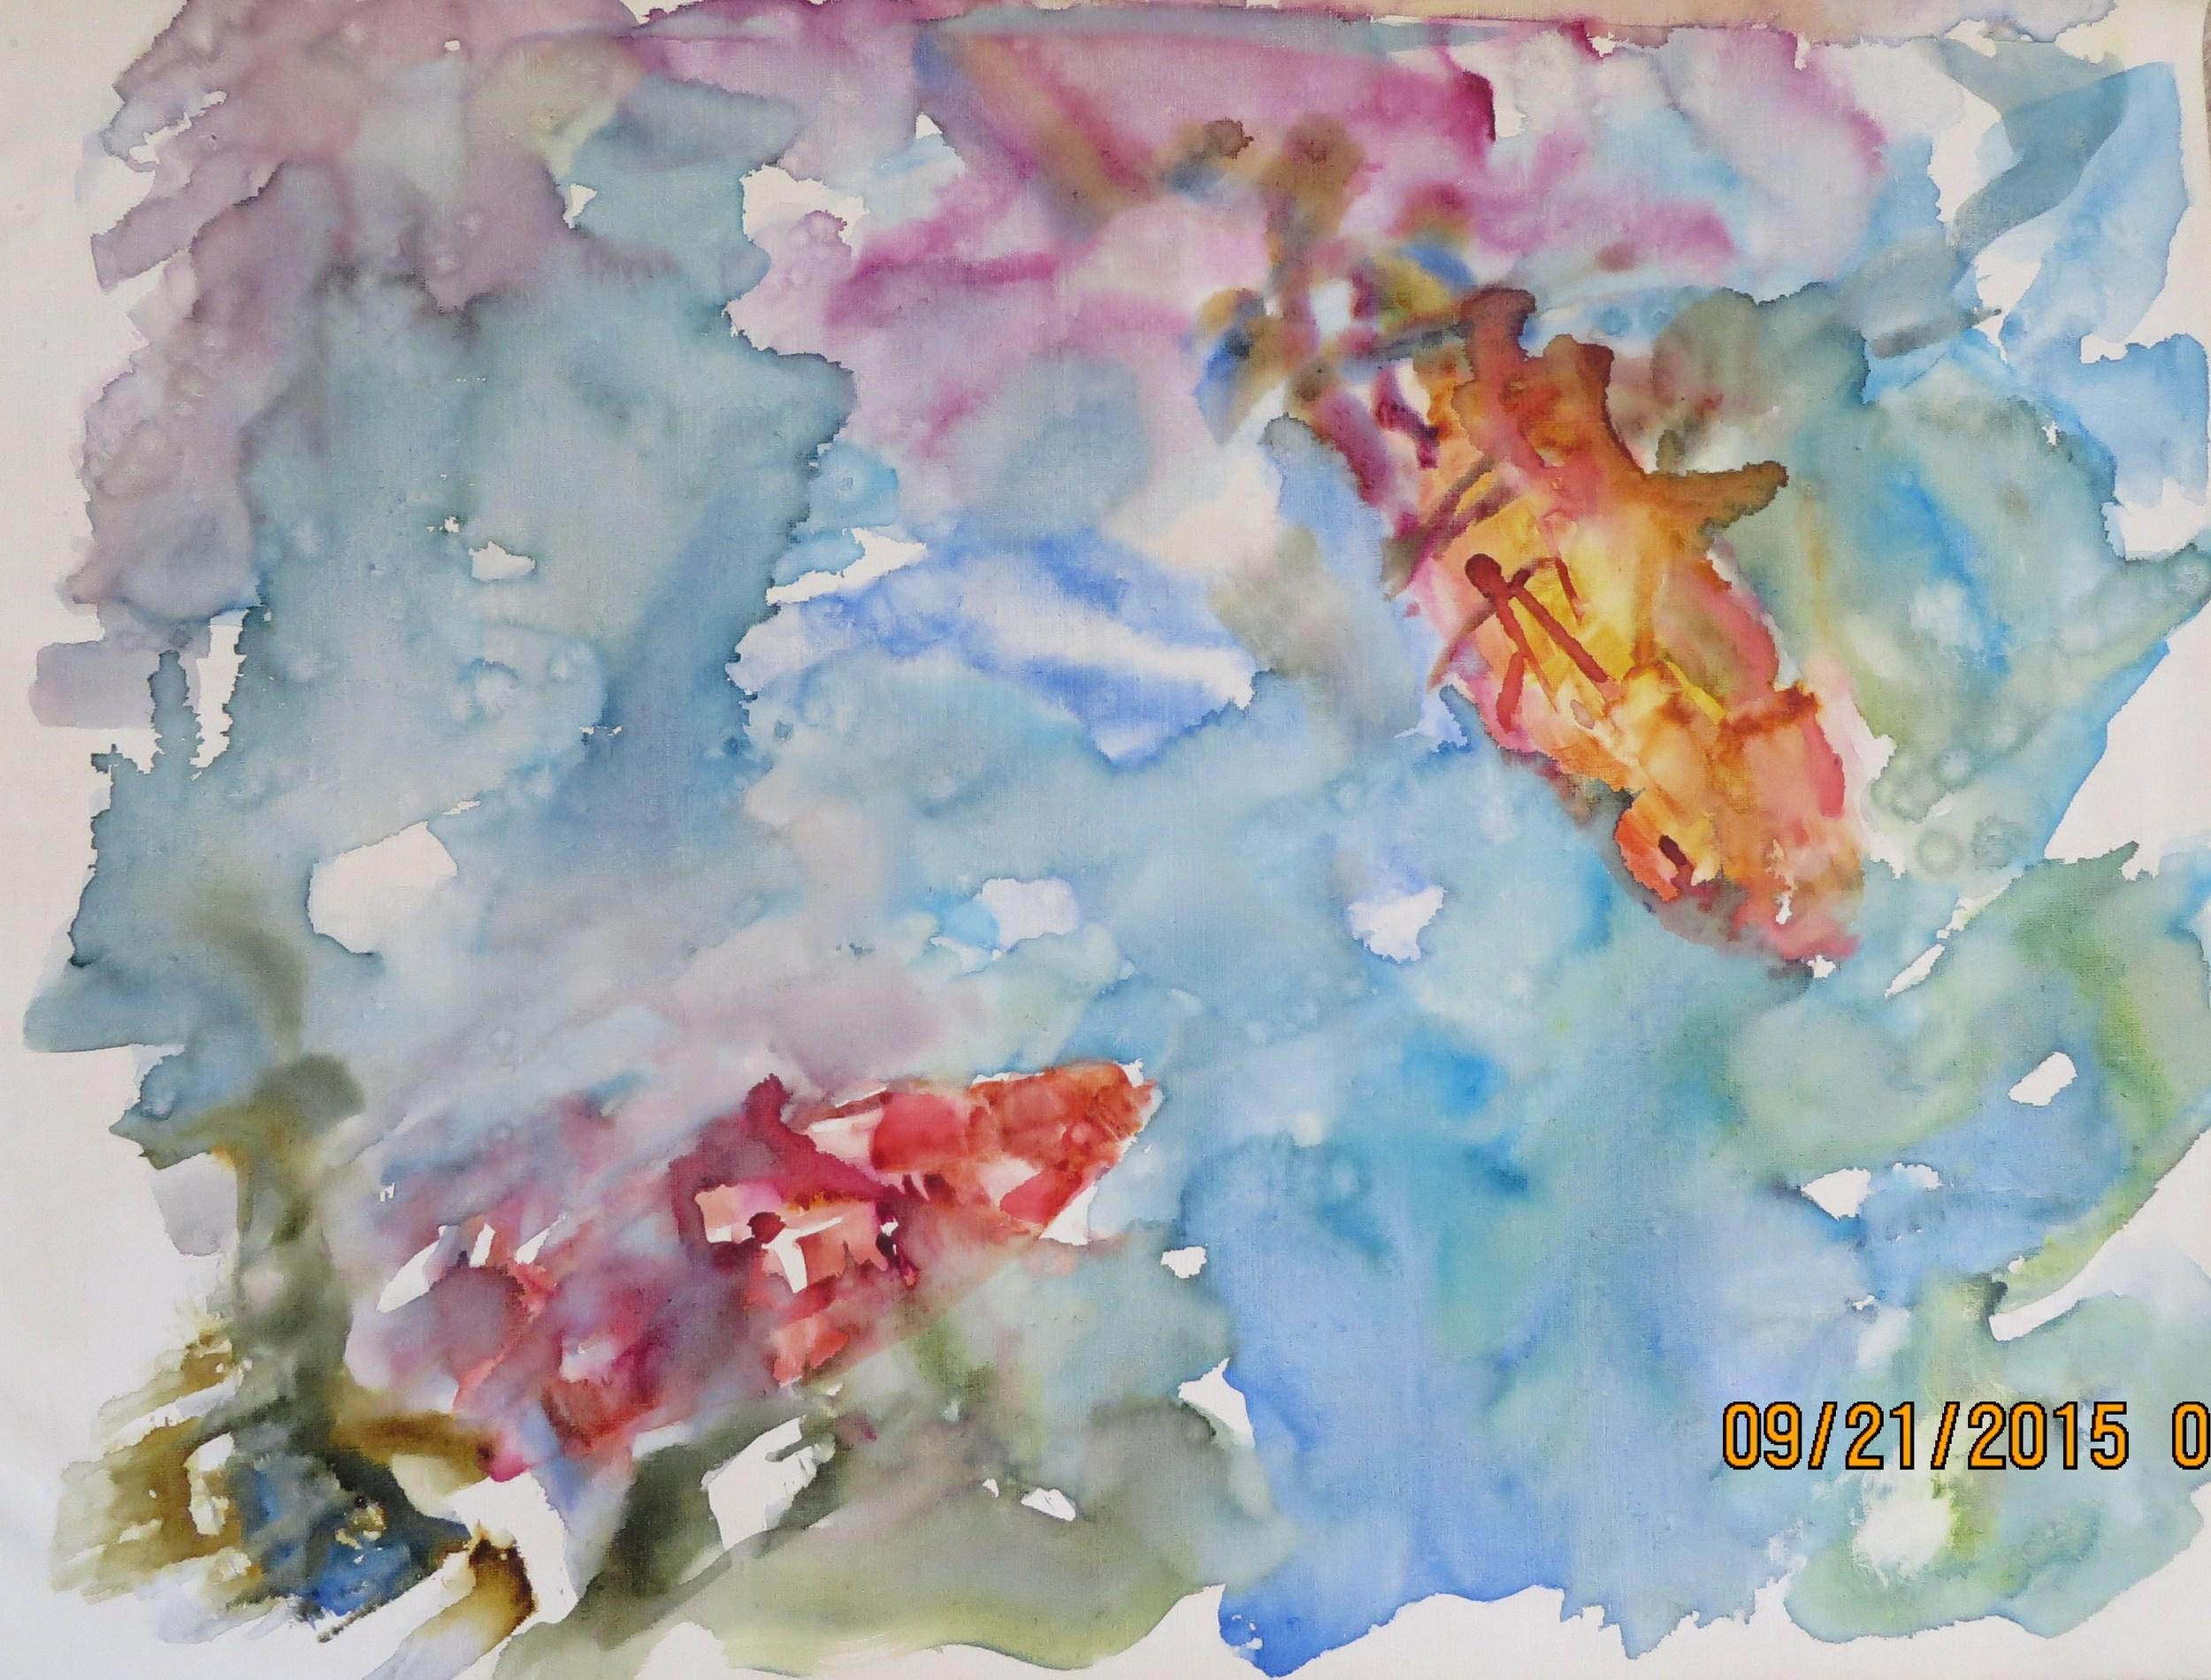 PIX OF ARTWORK 036.JPG